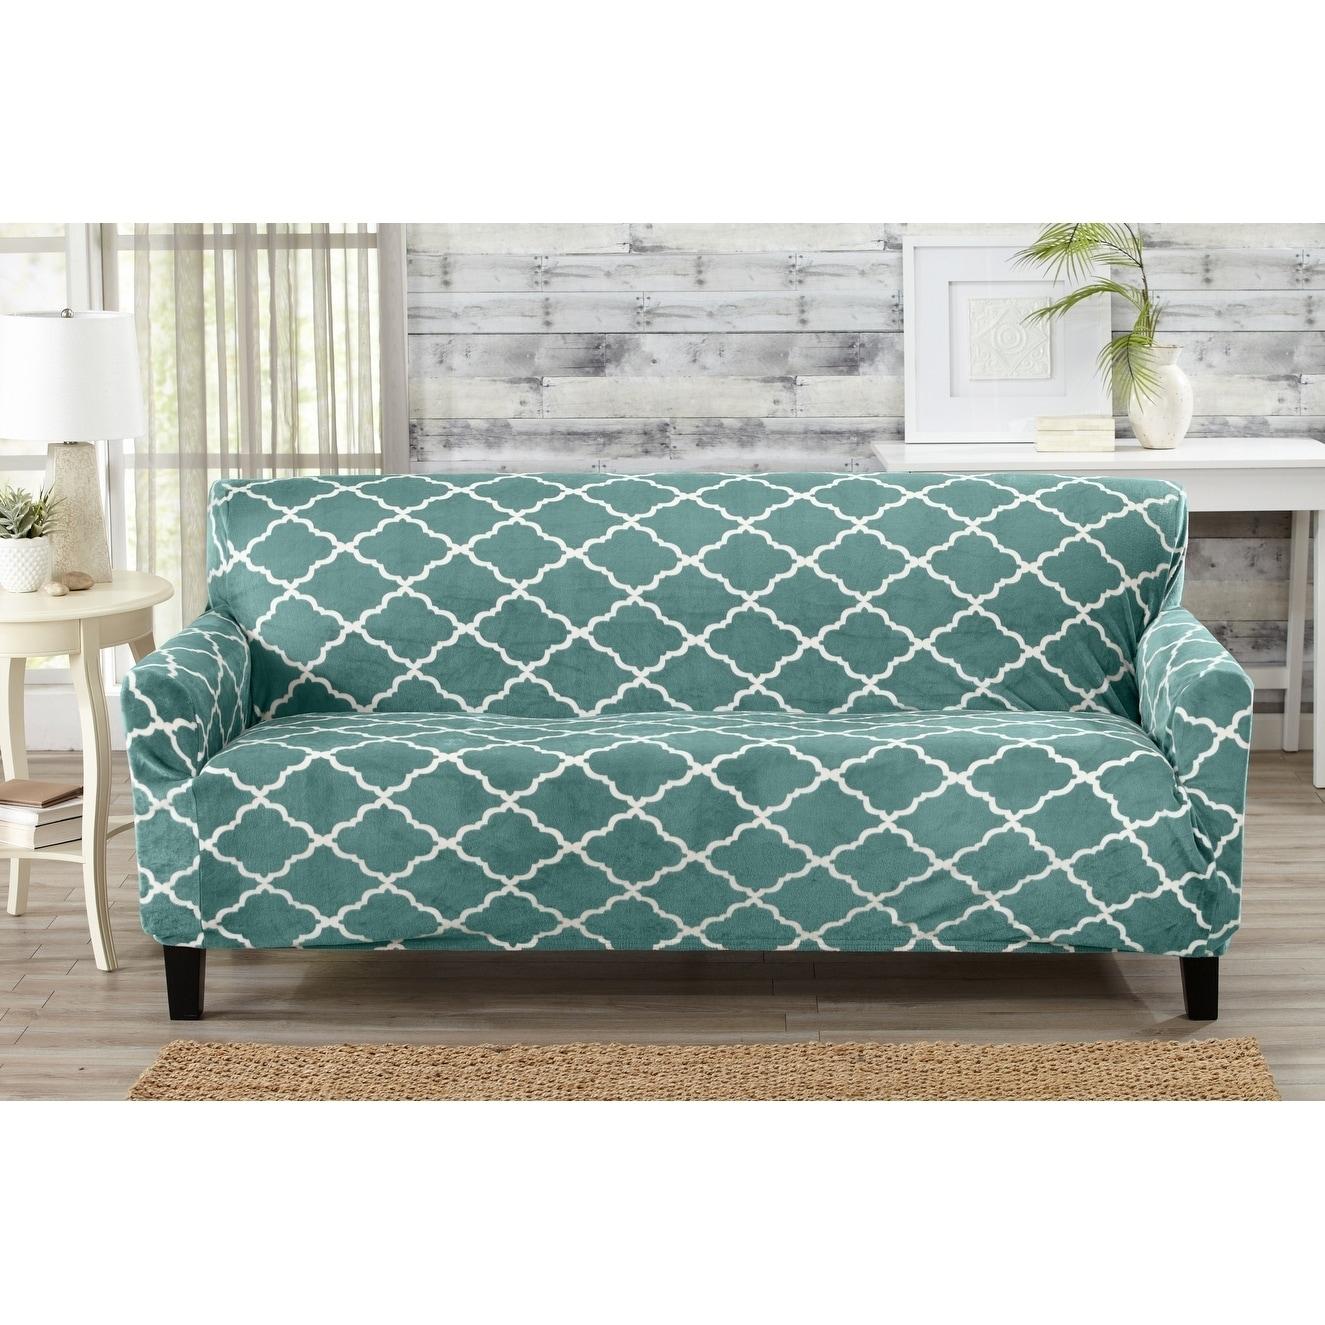 Printed Velvet Plush Form Fit Stretch Sofa Slipcover Magnolia  ~ Turquoise Slipcover Sofa